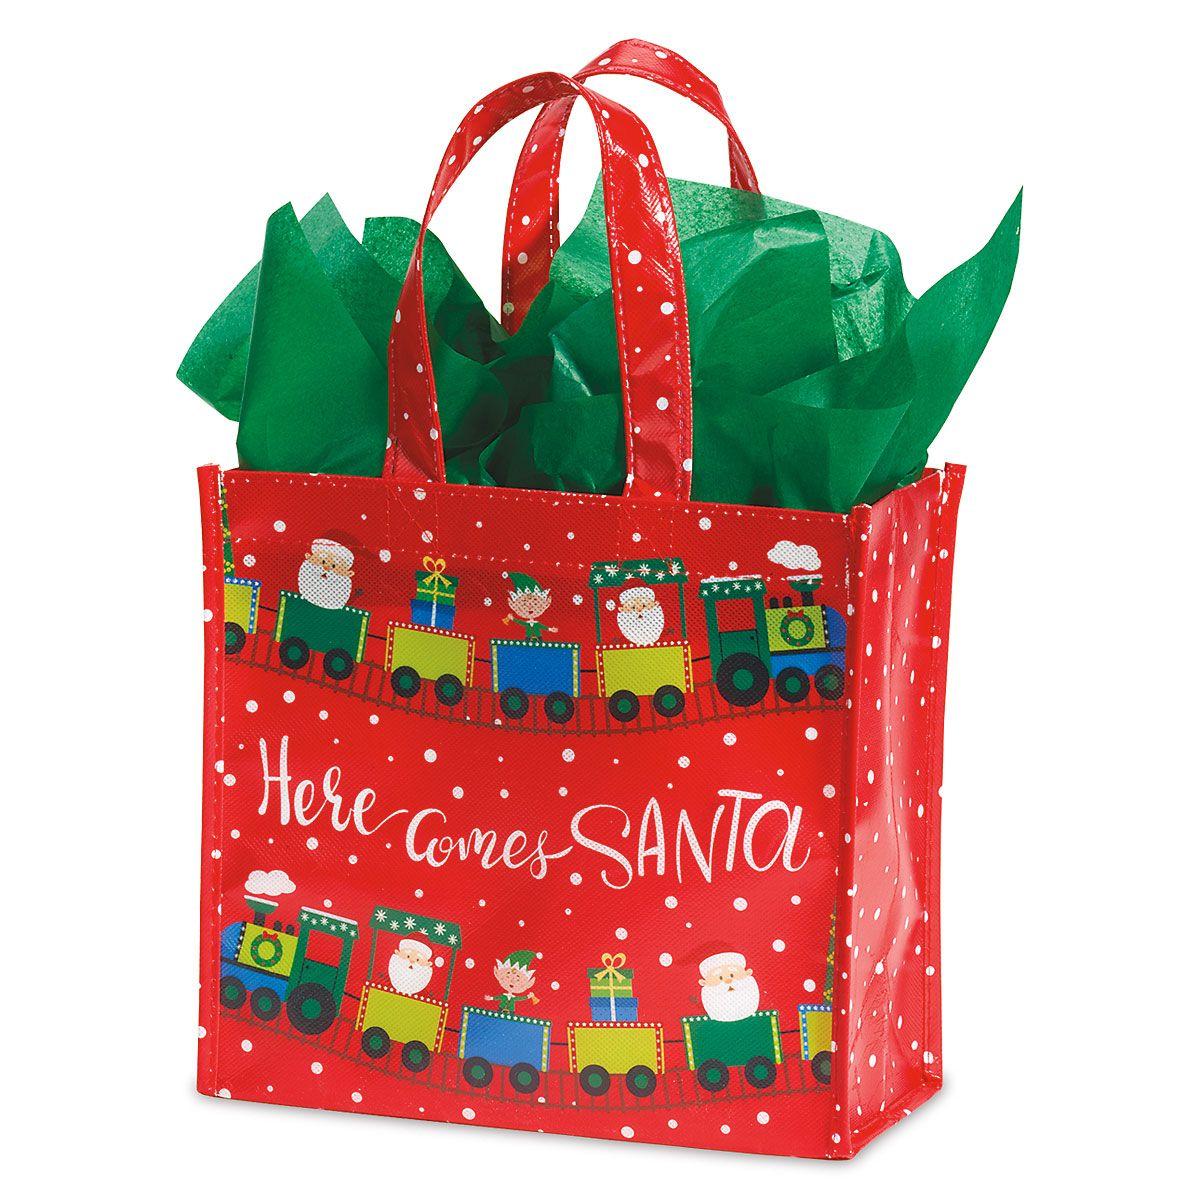 Santa's Helpers Cub Shopping Totes - BOGO